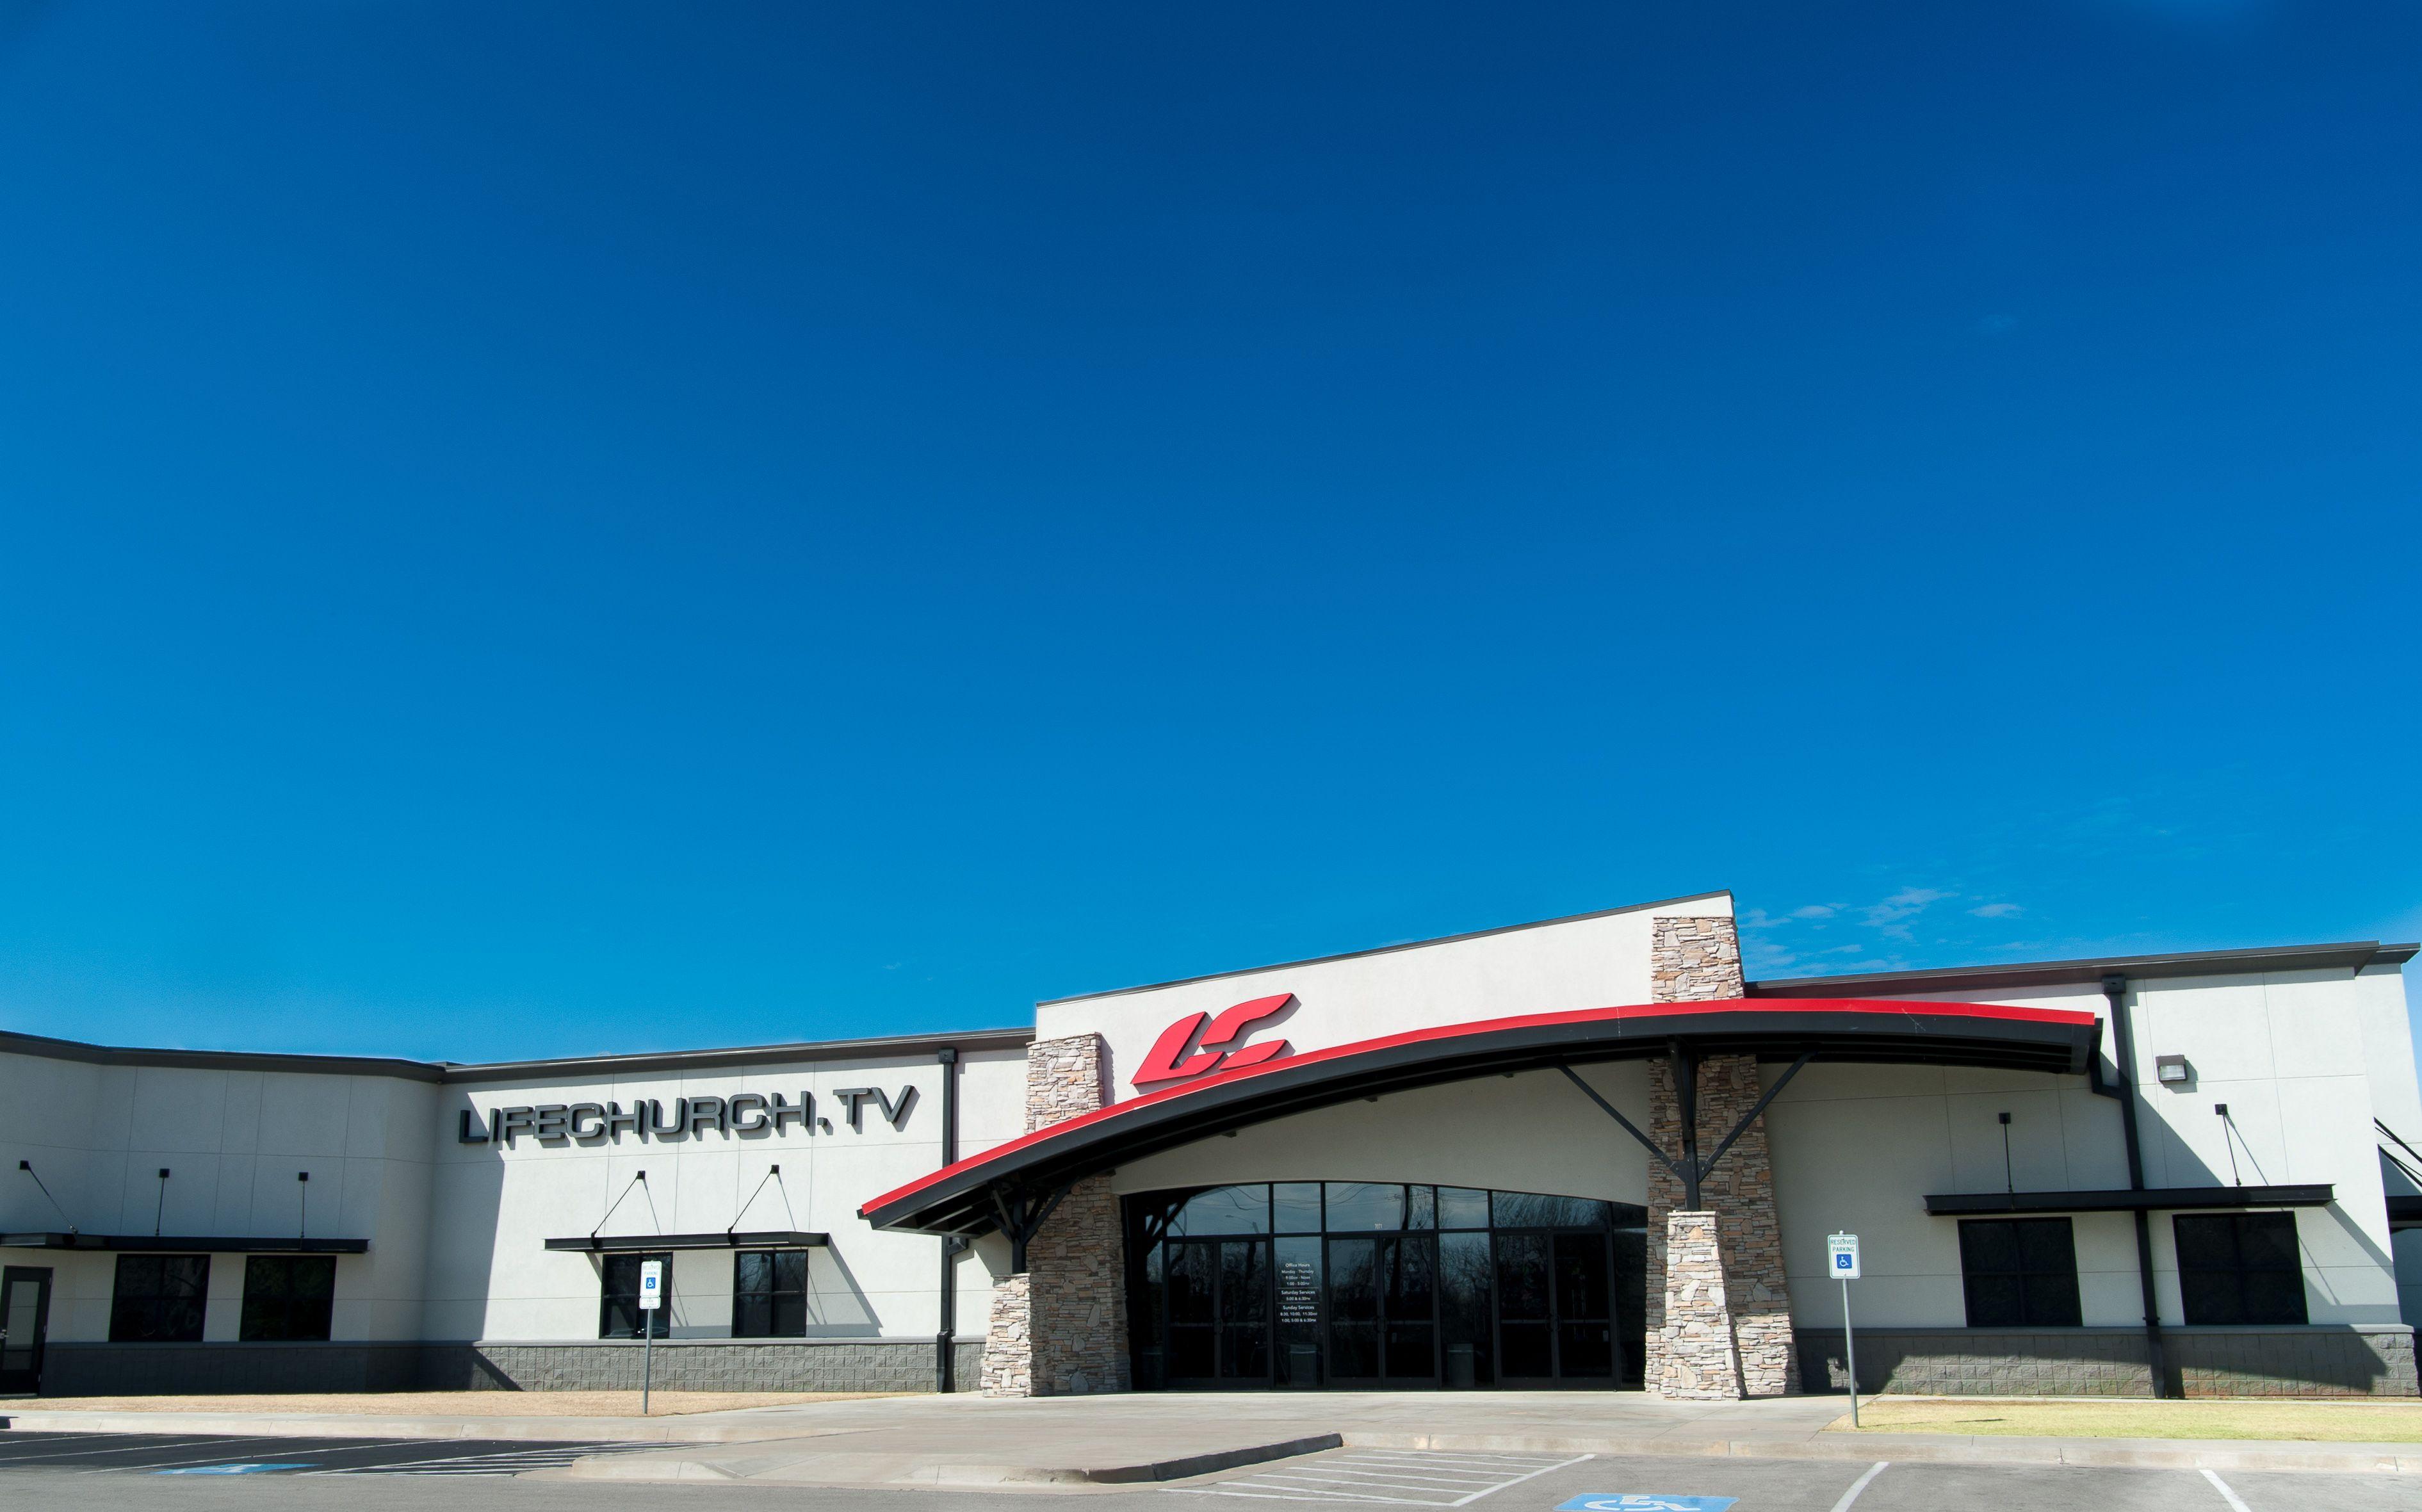 LifeChurch.tv South Tulsa Campus in Bixby, OK | Life Church | Pinterest